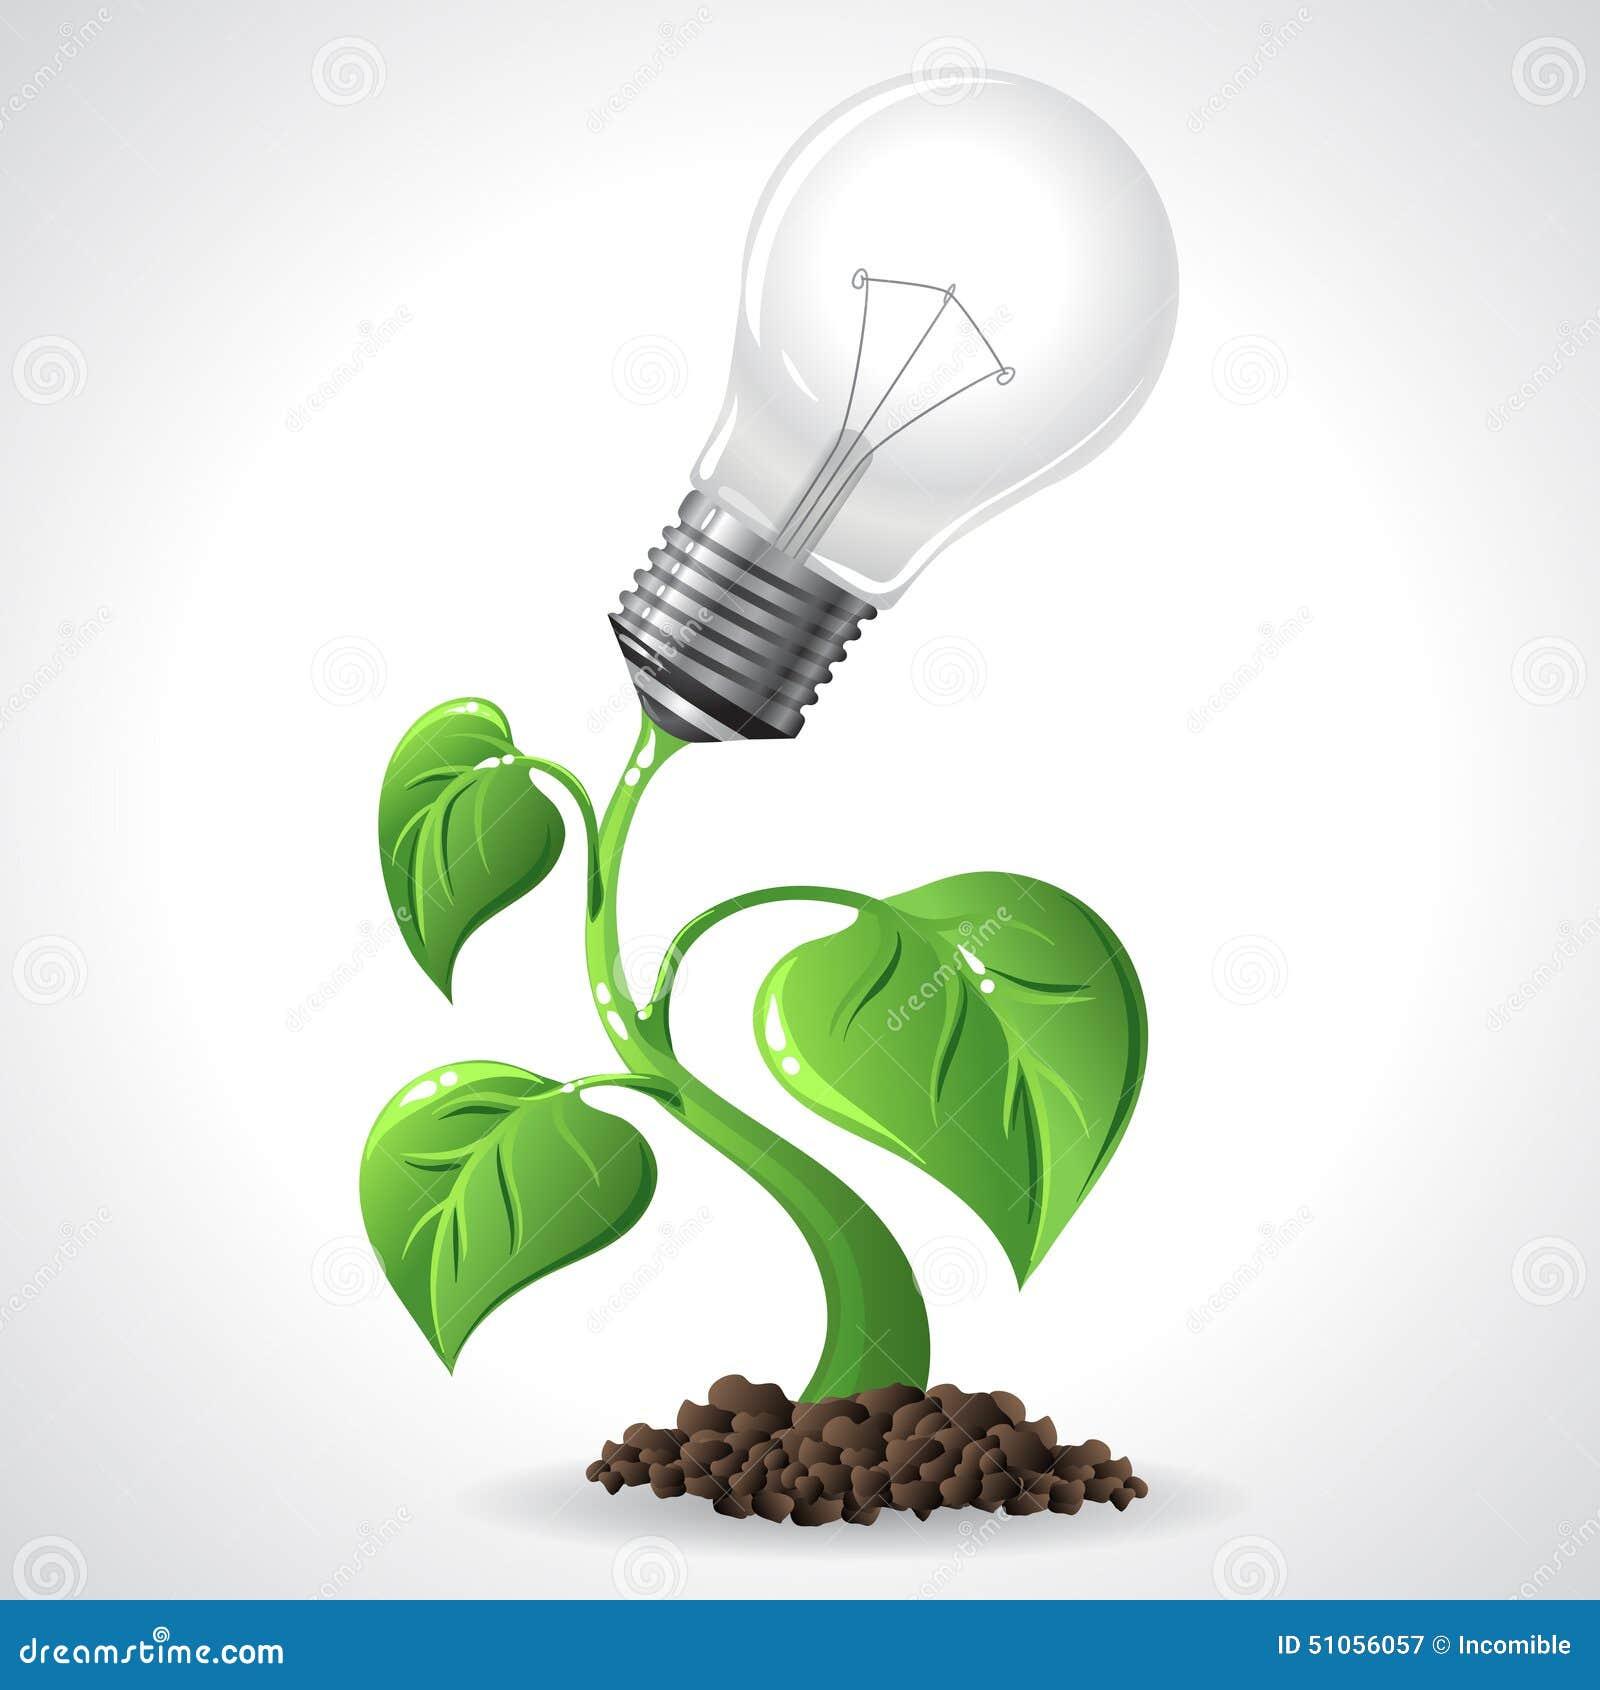 Green Energy Concept Power Saving Light Bulbs Stock Vector Image 51056057